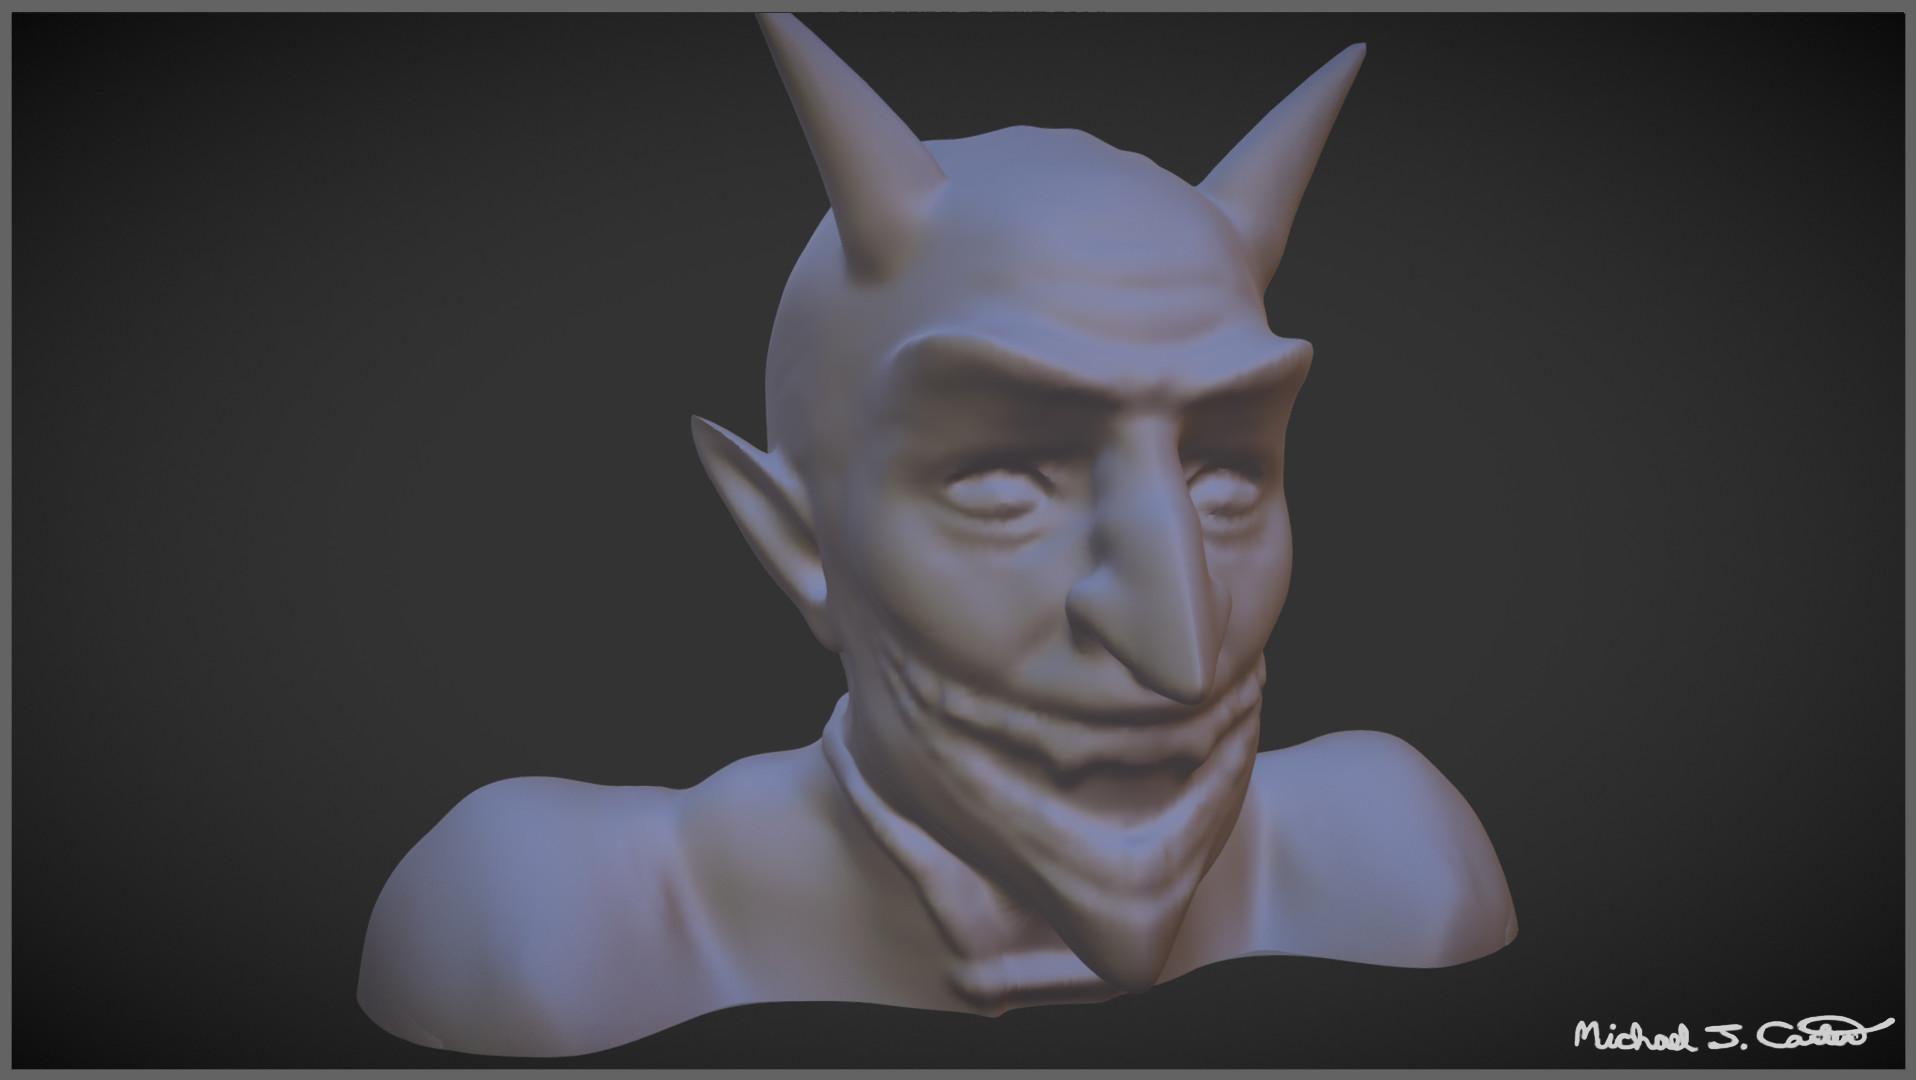 Michael jake carter mcarter demon sculpt 3 4th image